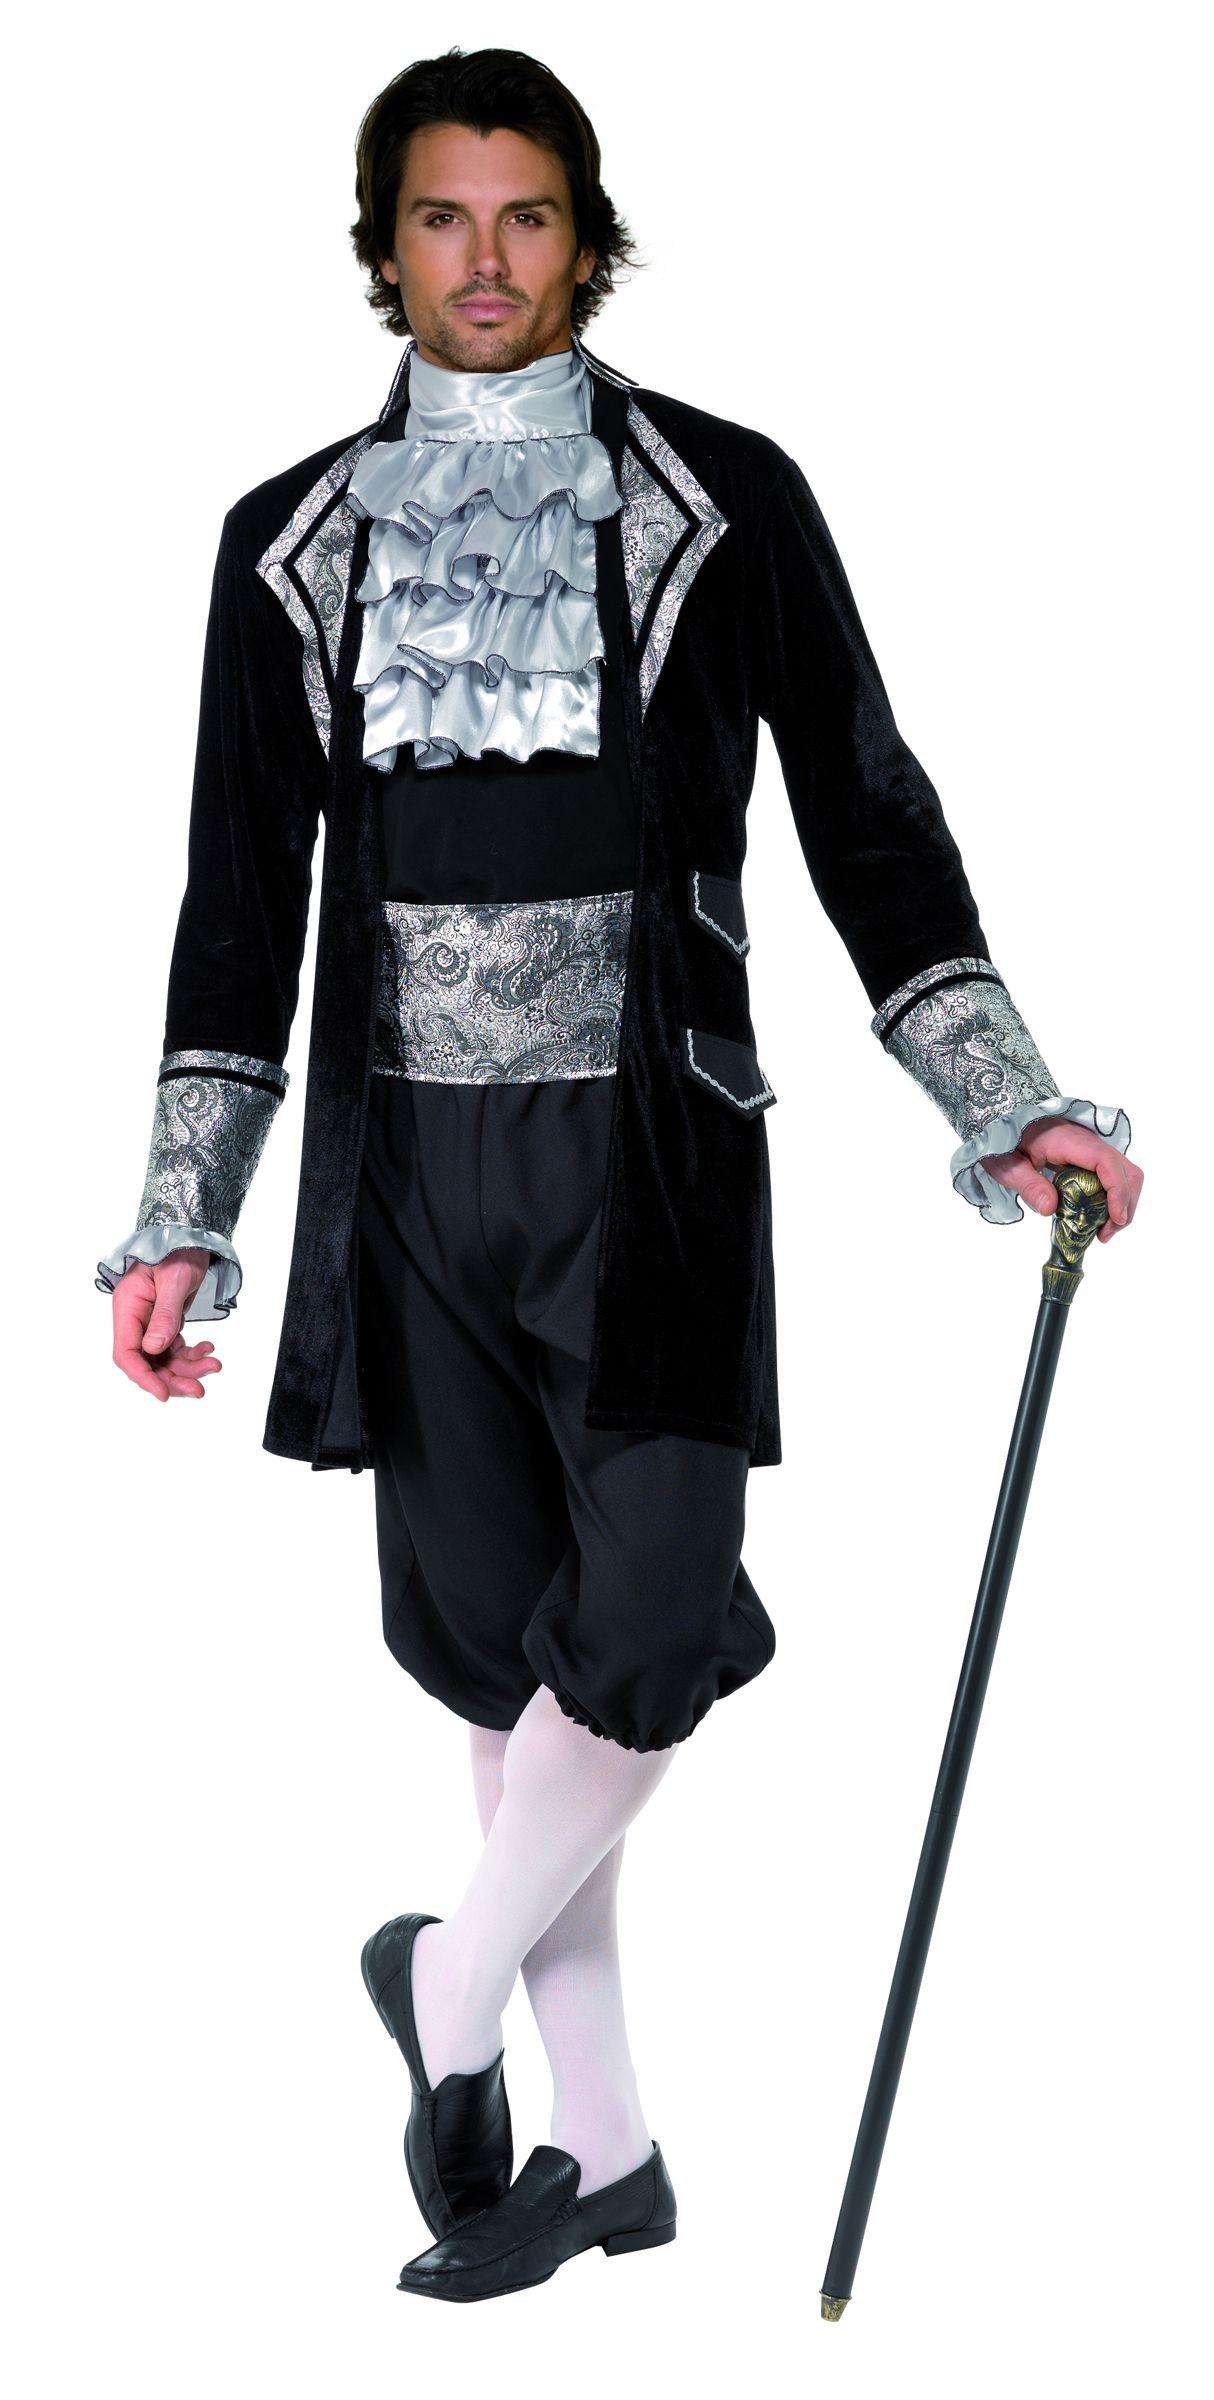 Costume vampiro barocco uomo Halloween  Lussuoso costume da vampiro per  uomo in stile barocco  513bfc09ea4a